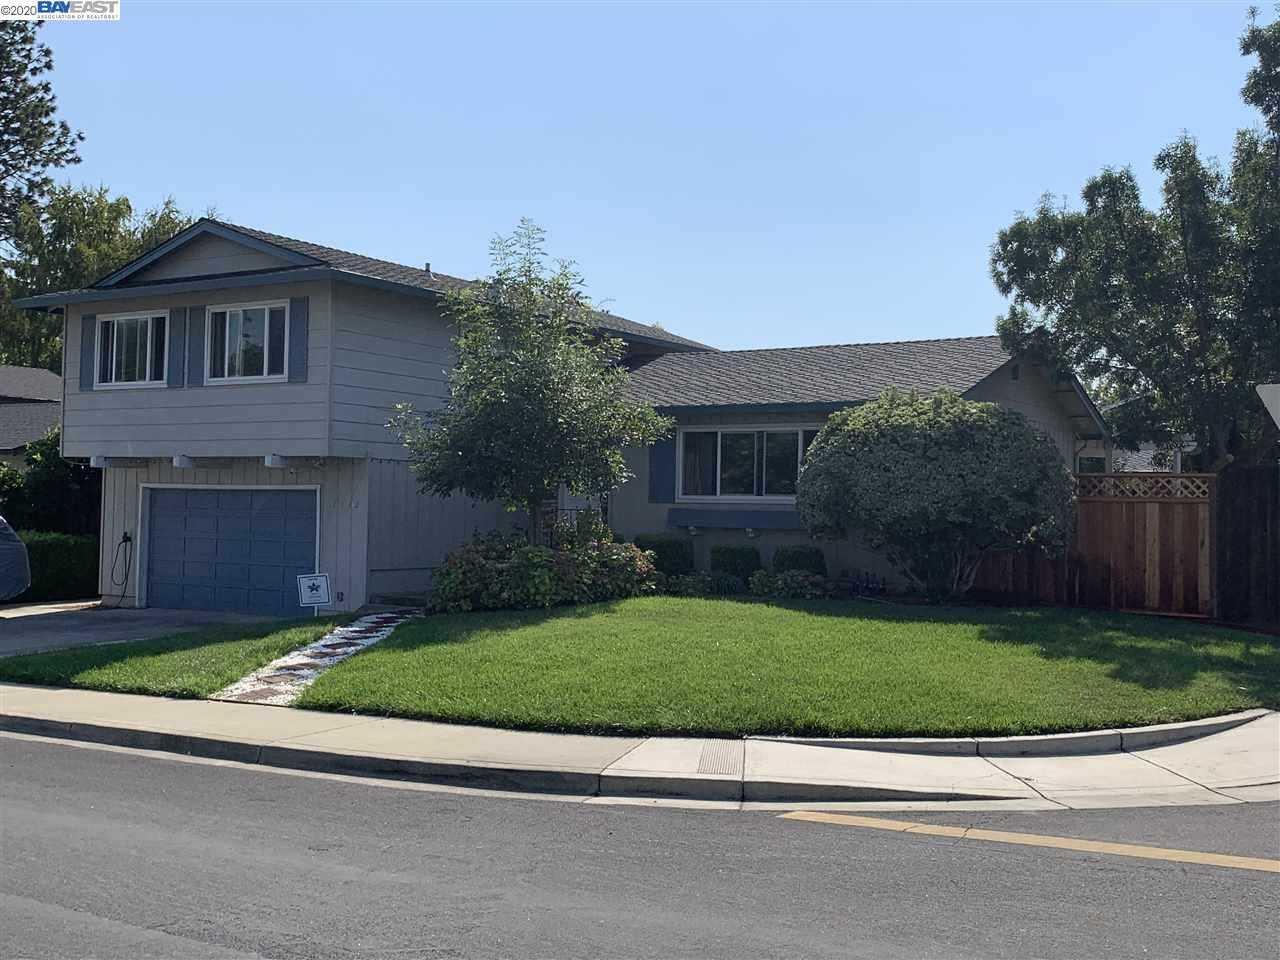 7432 Highland Oaks Dr PLEASANTON, CA 94588